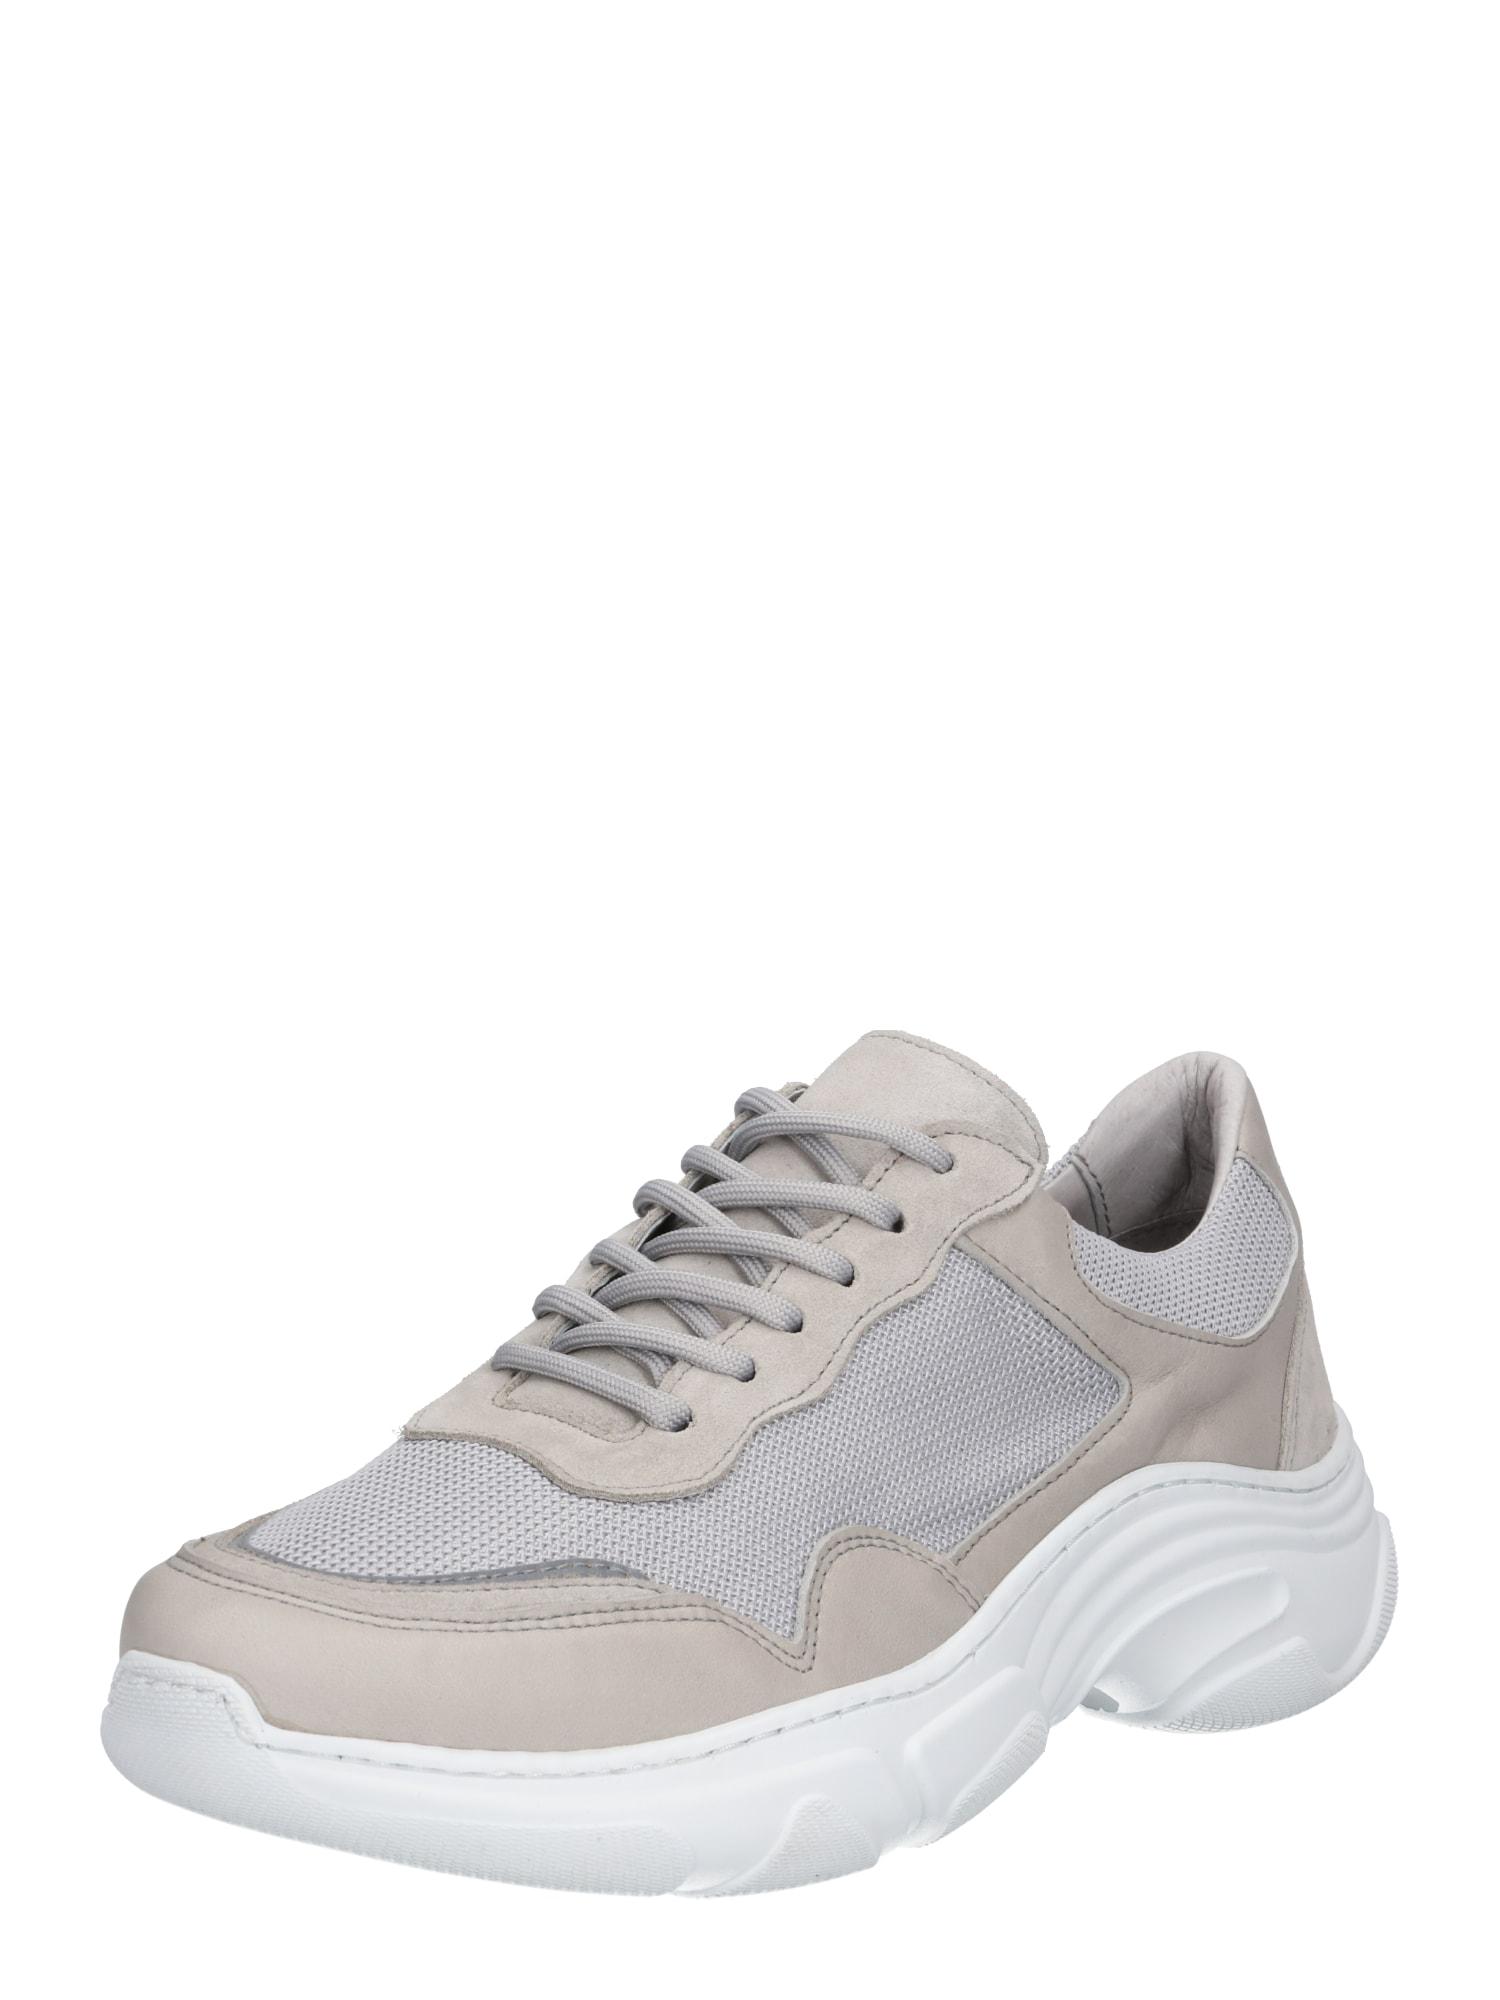 Tenisky Flex světle šedá bílá Garment Project